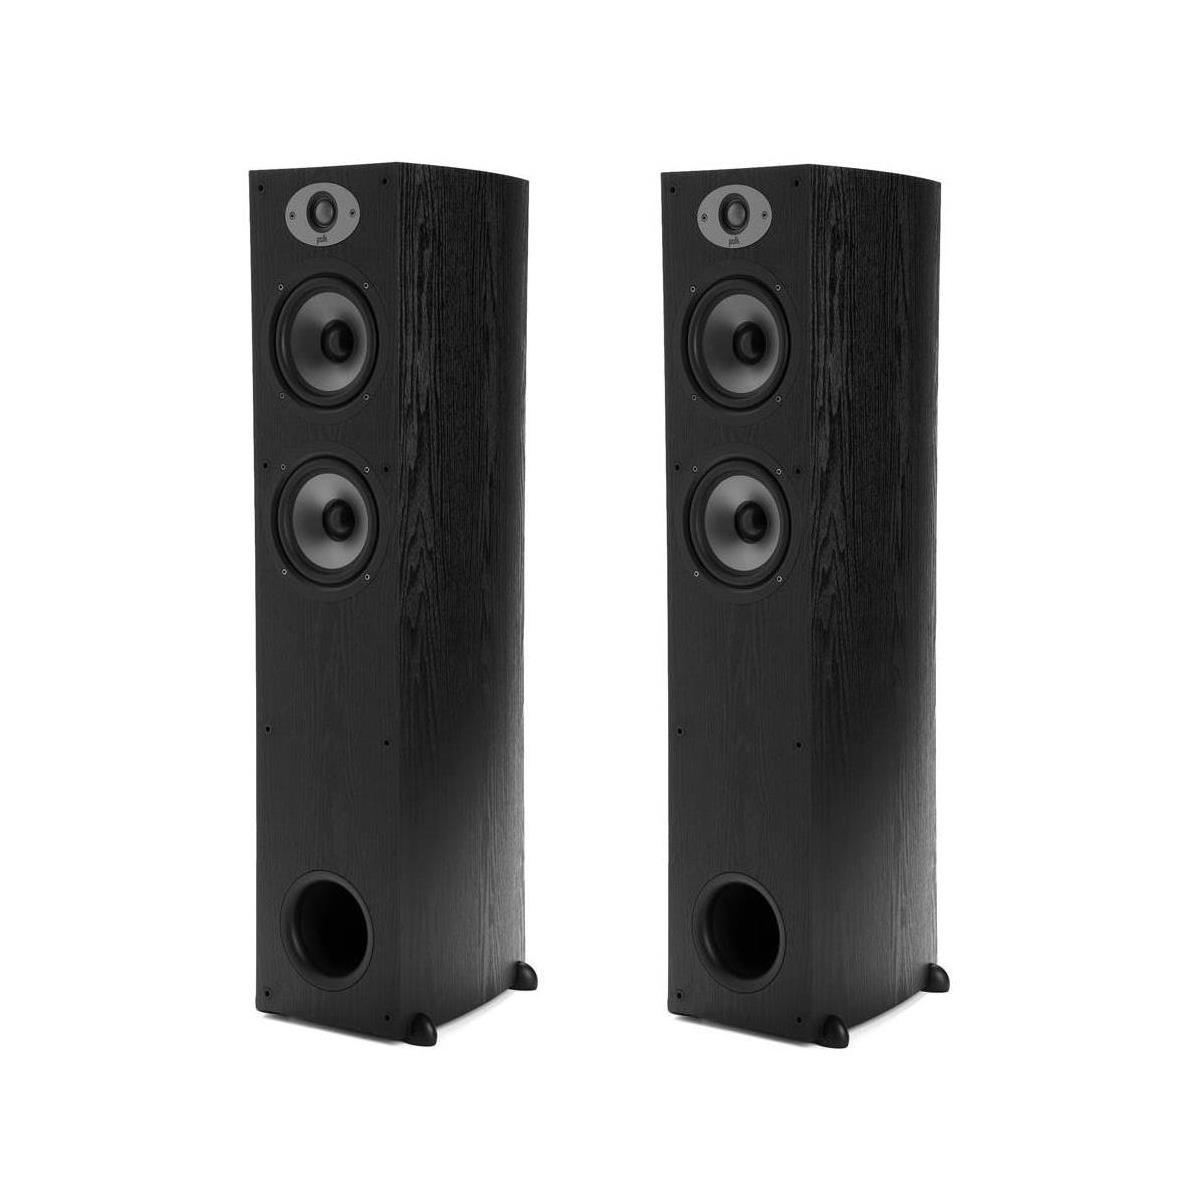 Pair of Polk Audio TSx 330T 2-Way High Performance Floorstanding Tower Speaker $249.99 + Free Shipping